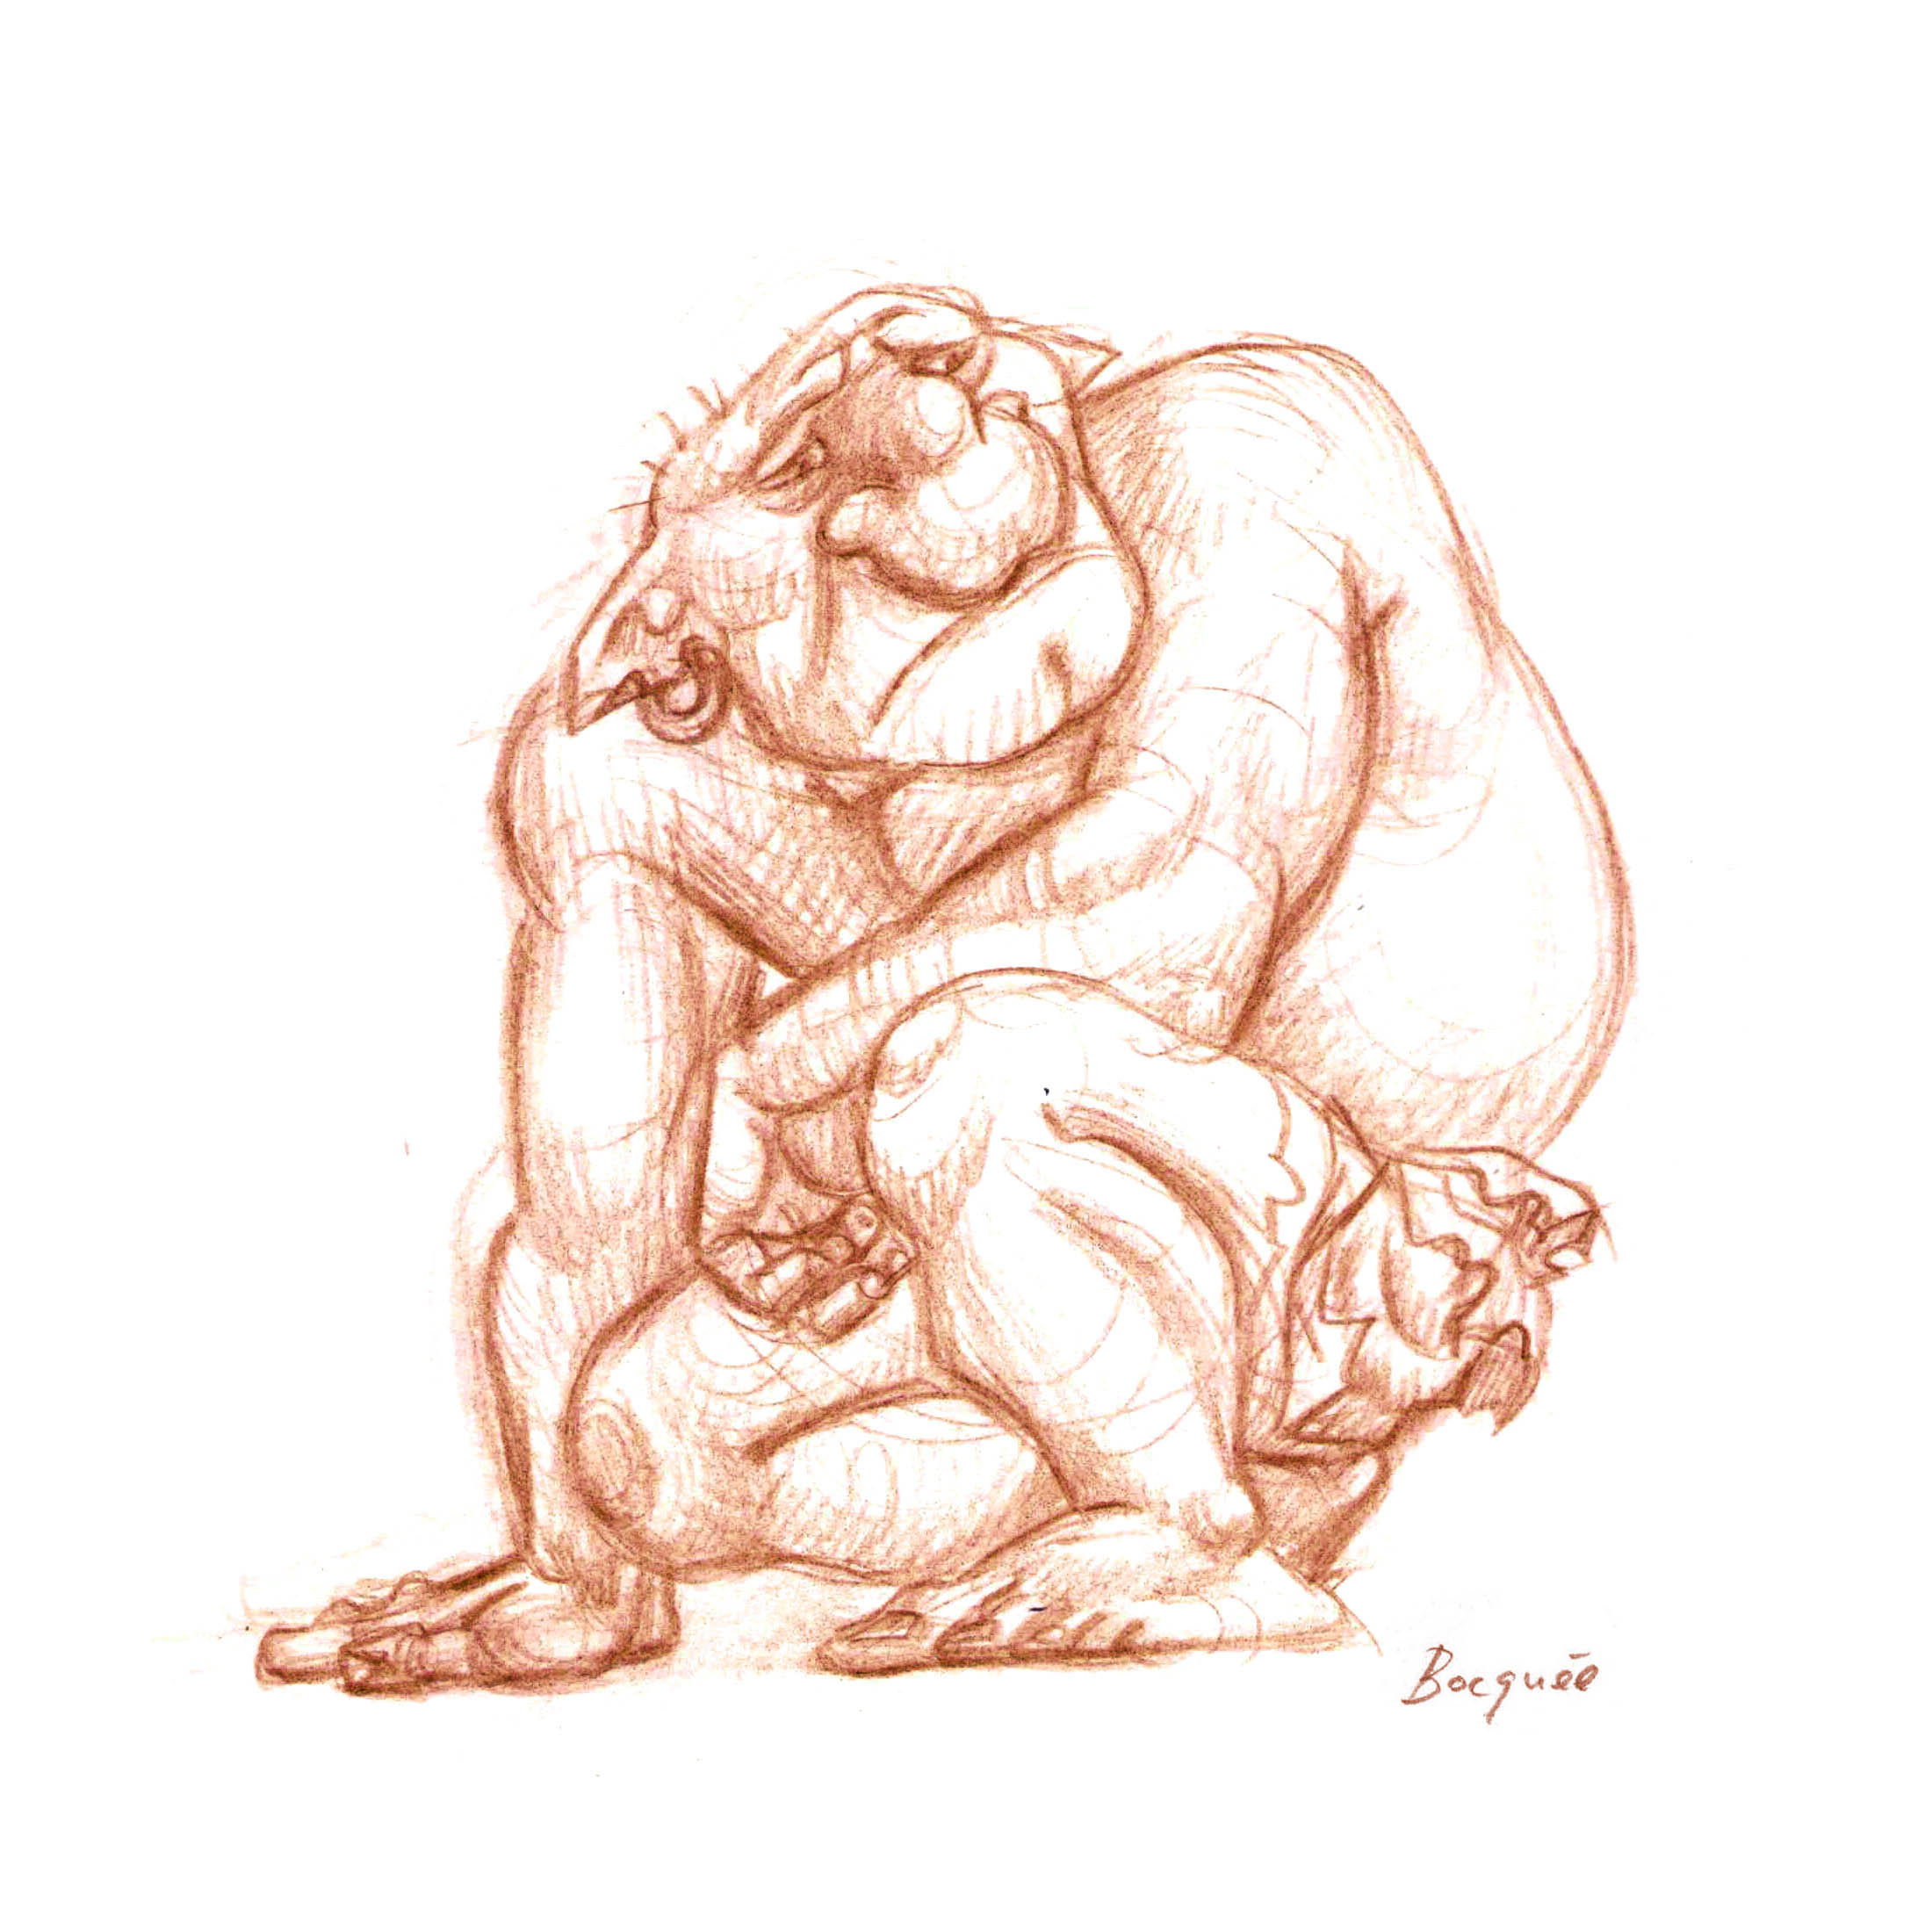 Crouching ogre